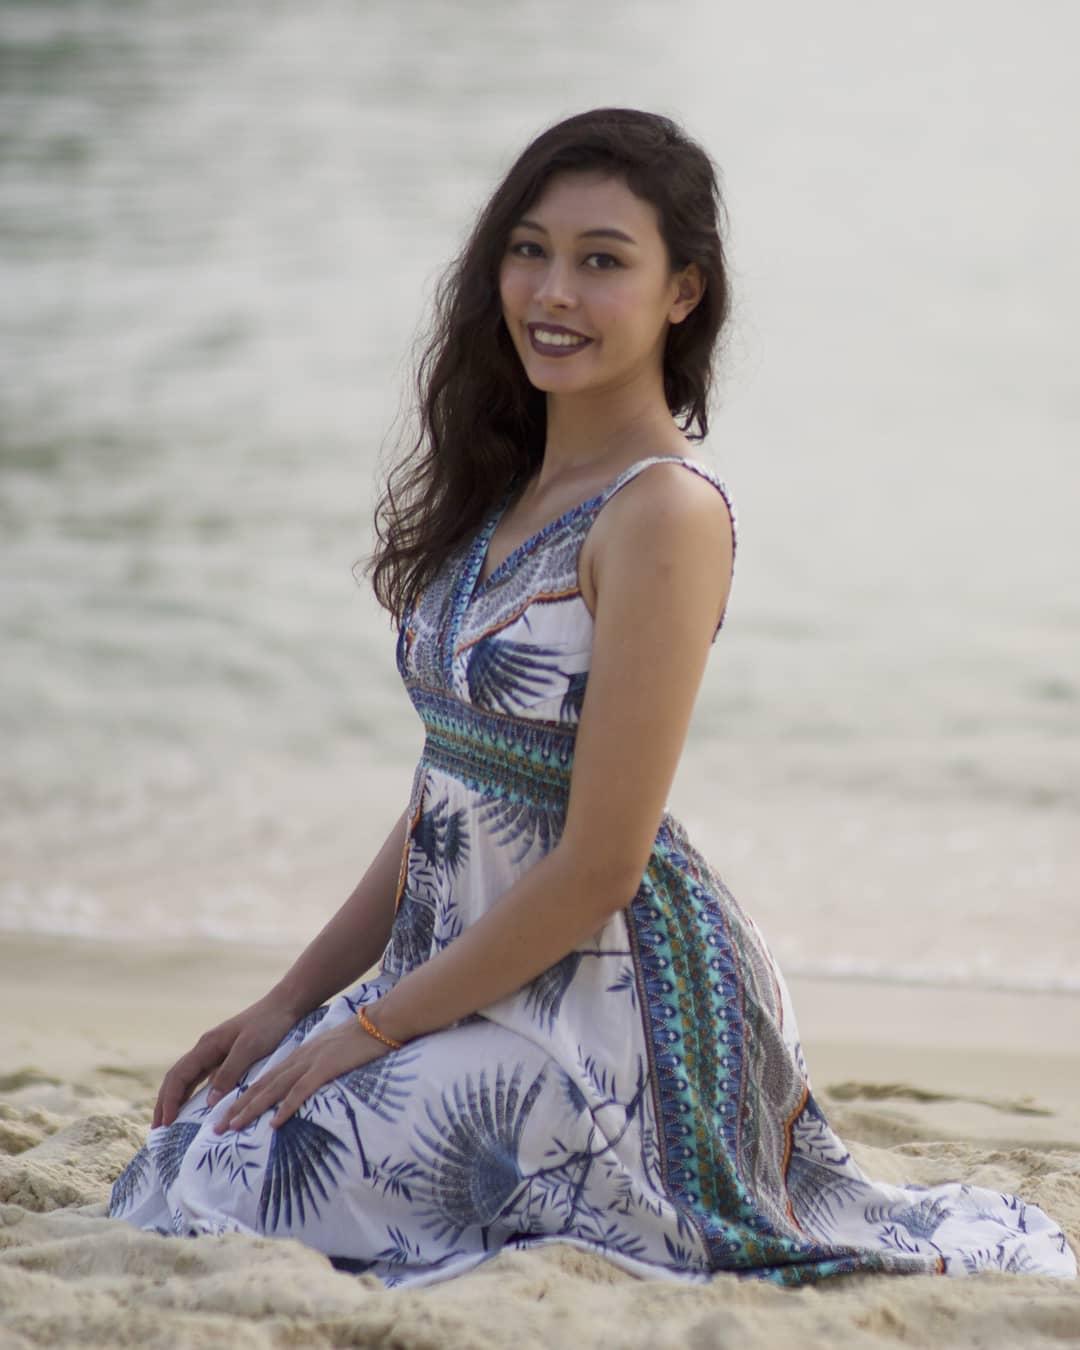 candidatas a miss universe singapore 2018. final: 31 agosto. Flq8qll4